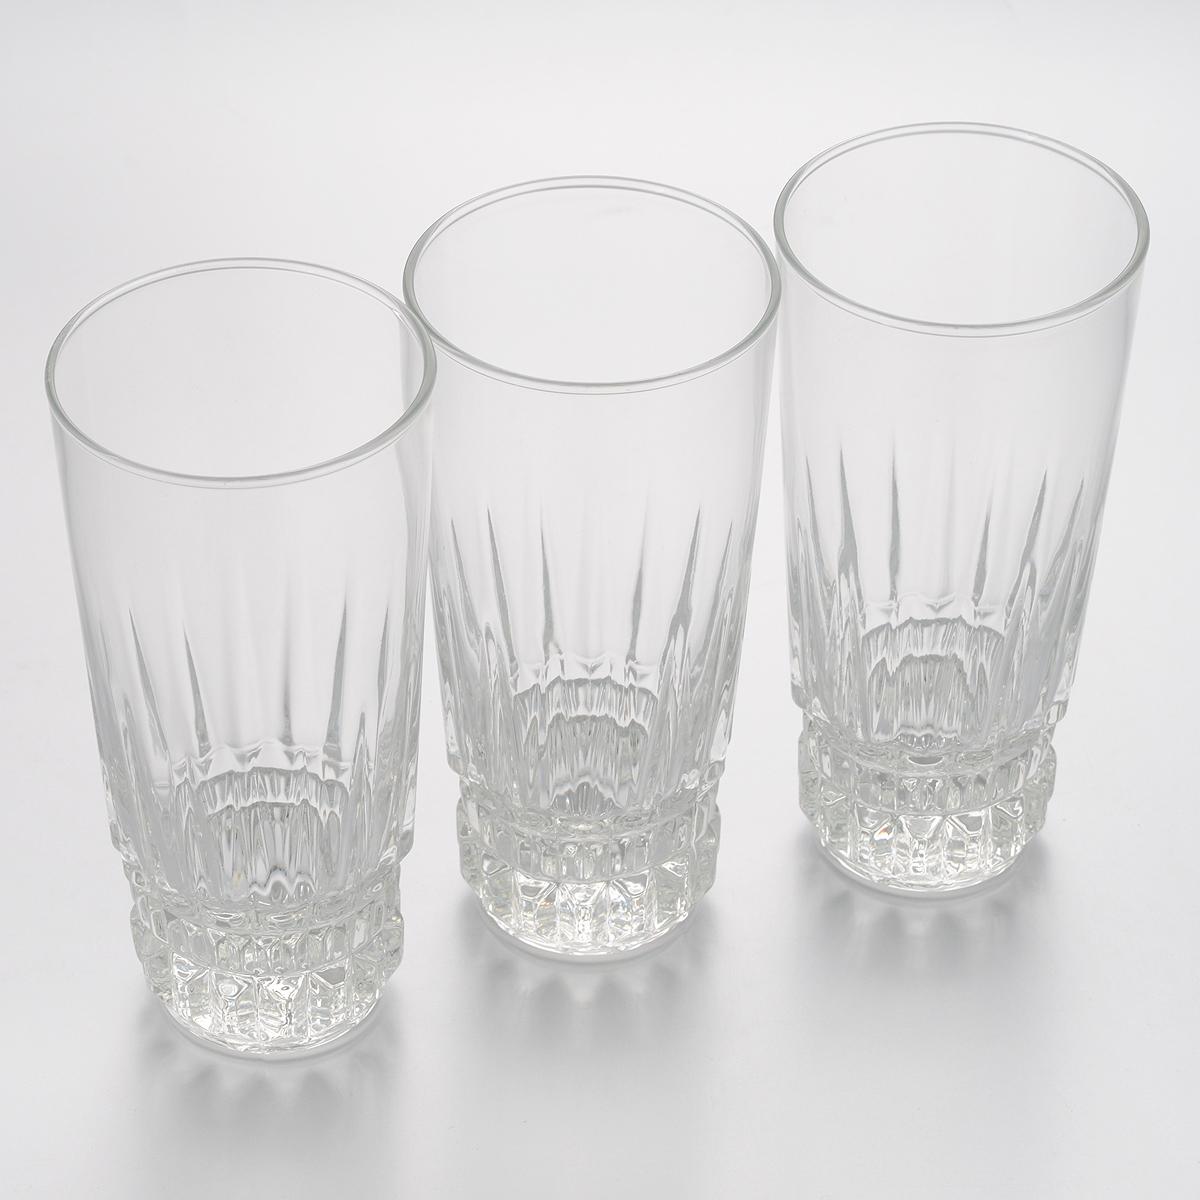 Набор стаканов Luminarc Imperator, 310 мл, 3 шт